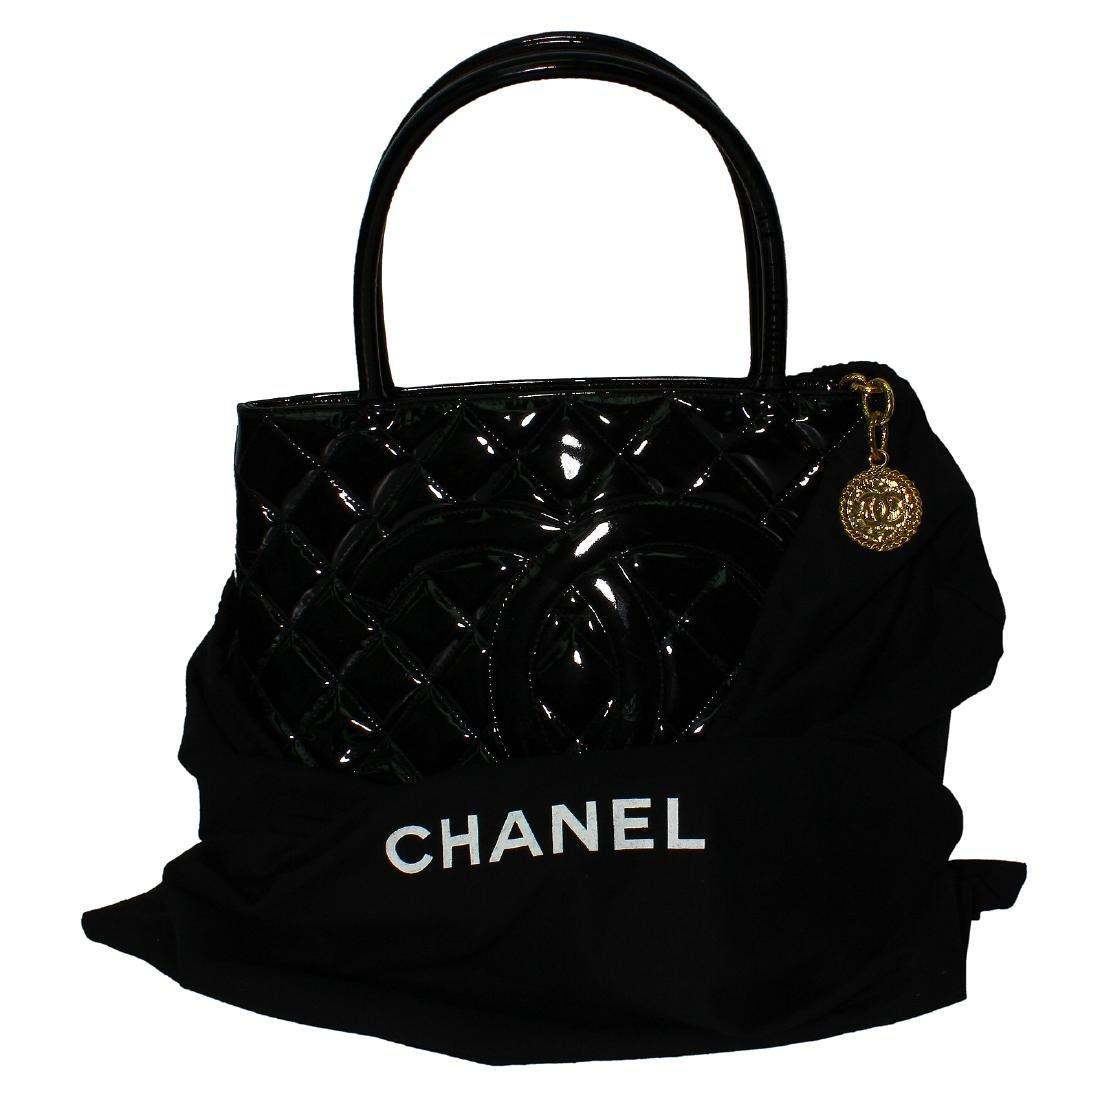 Chanel Quilted Black Patent Leather Shoulder Bag - 4